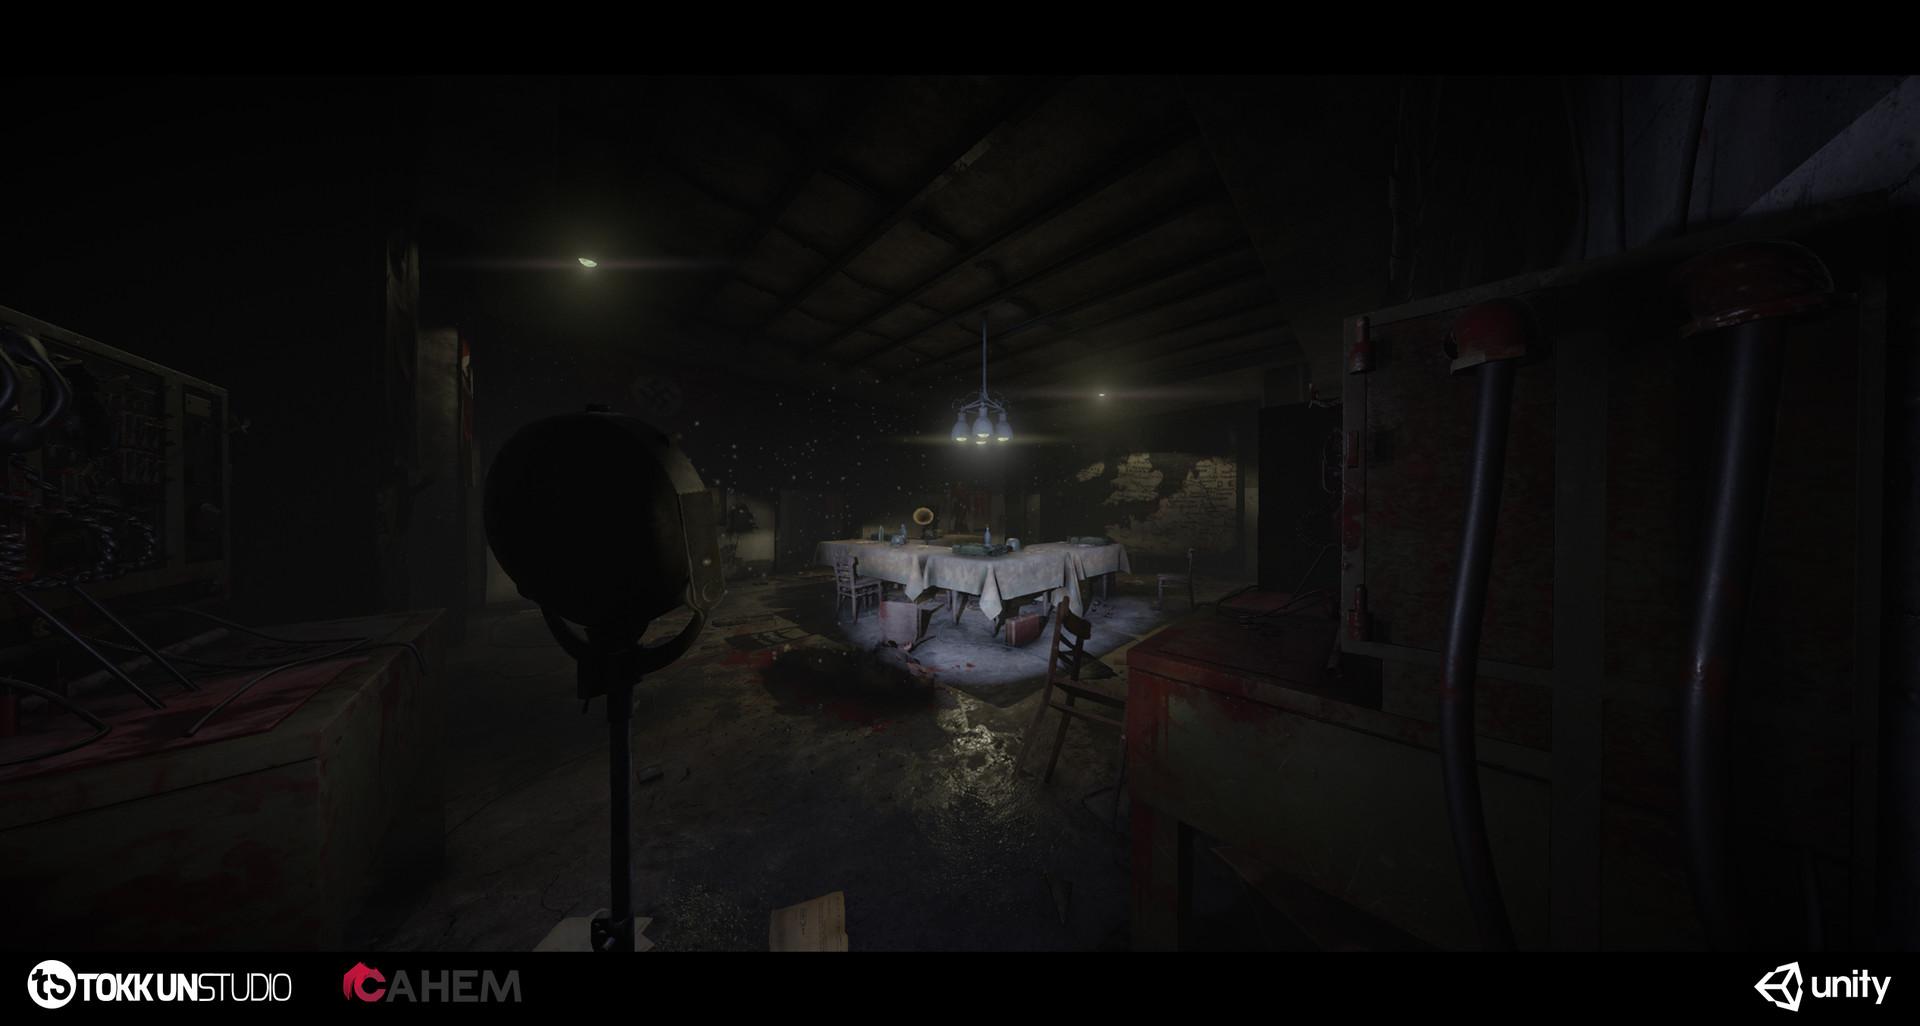 Tokkun studio bunker shot 43